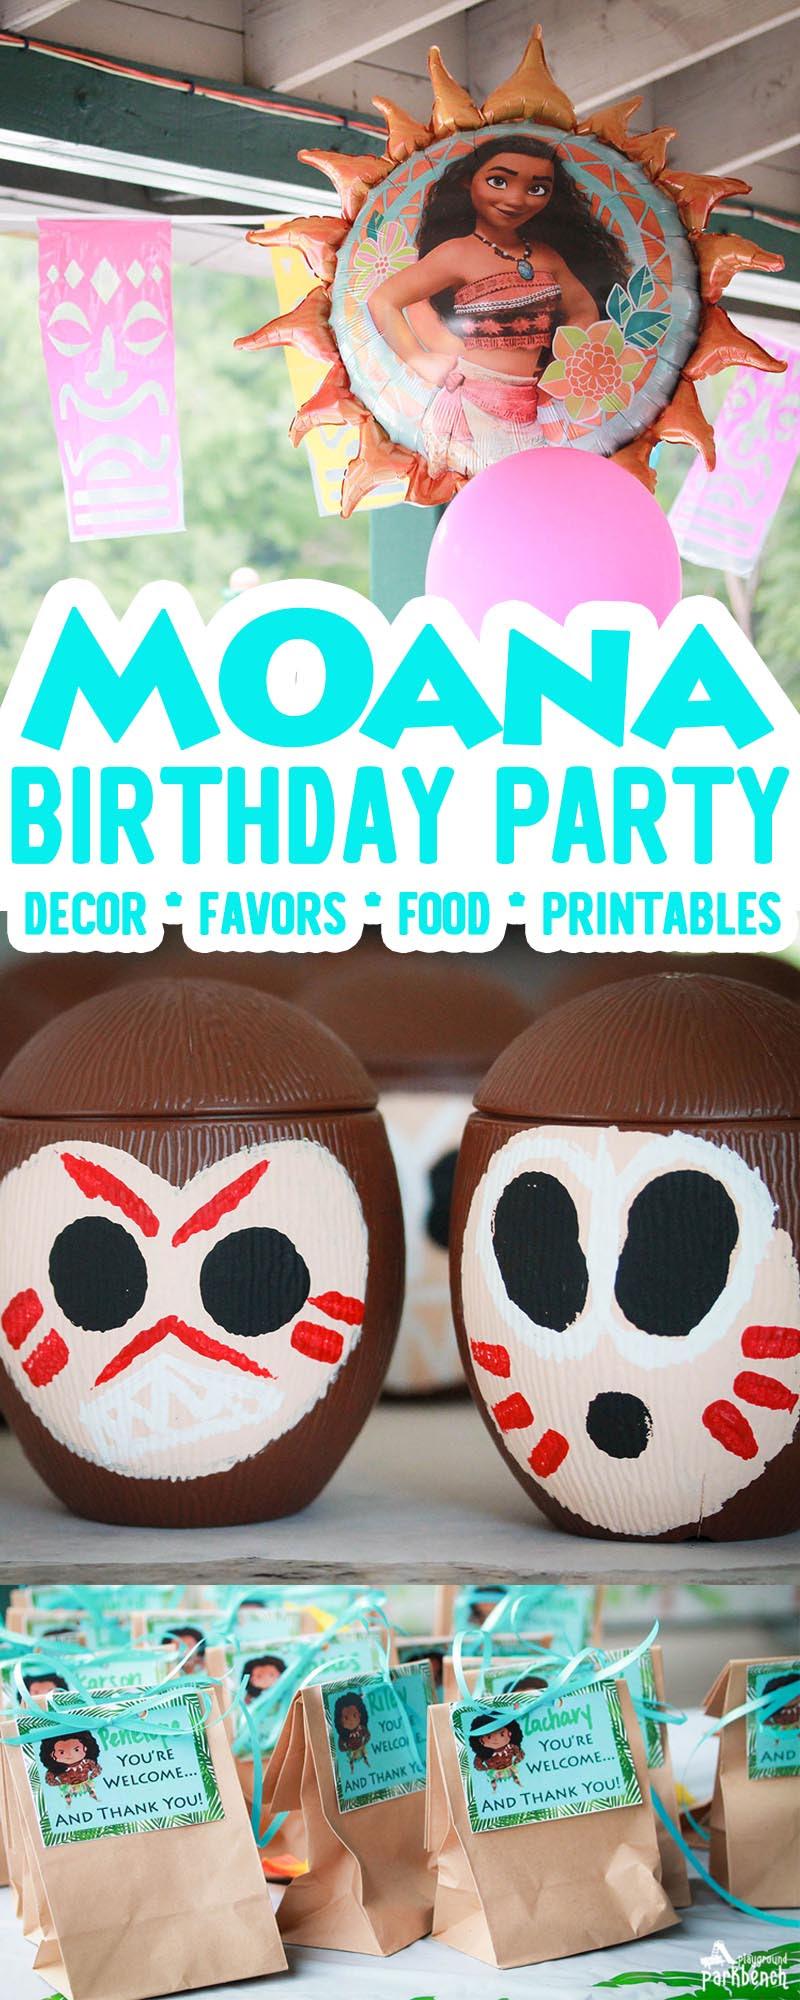 Make Way Moana Birthday Party Theme For Kids